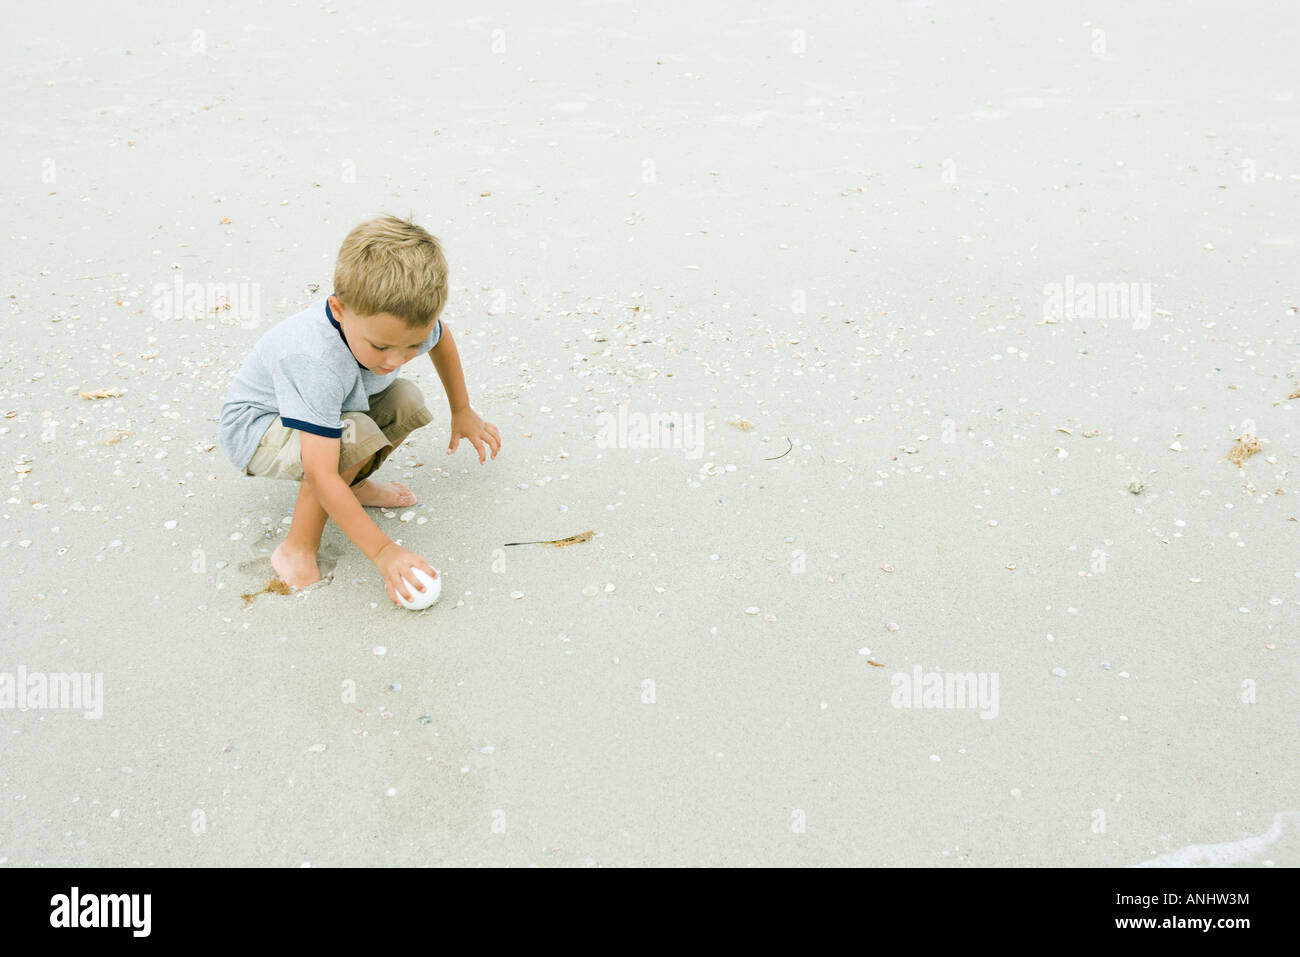 Little boy squatting, picking up ball on beach, full length - Stock Image